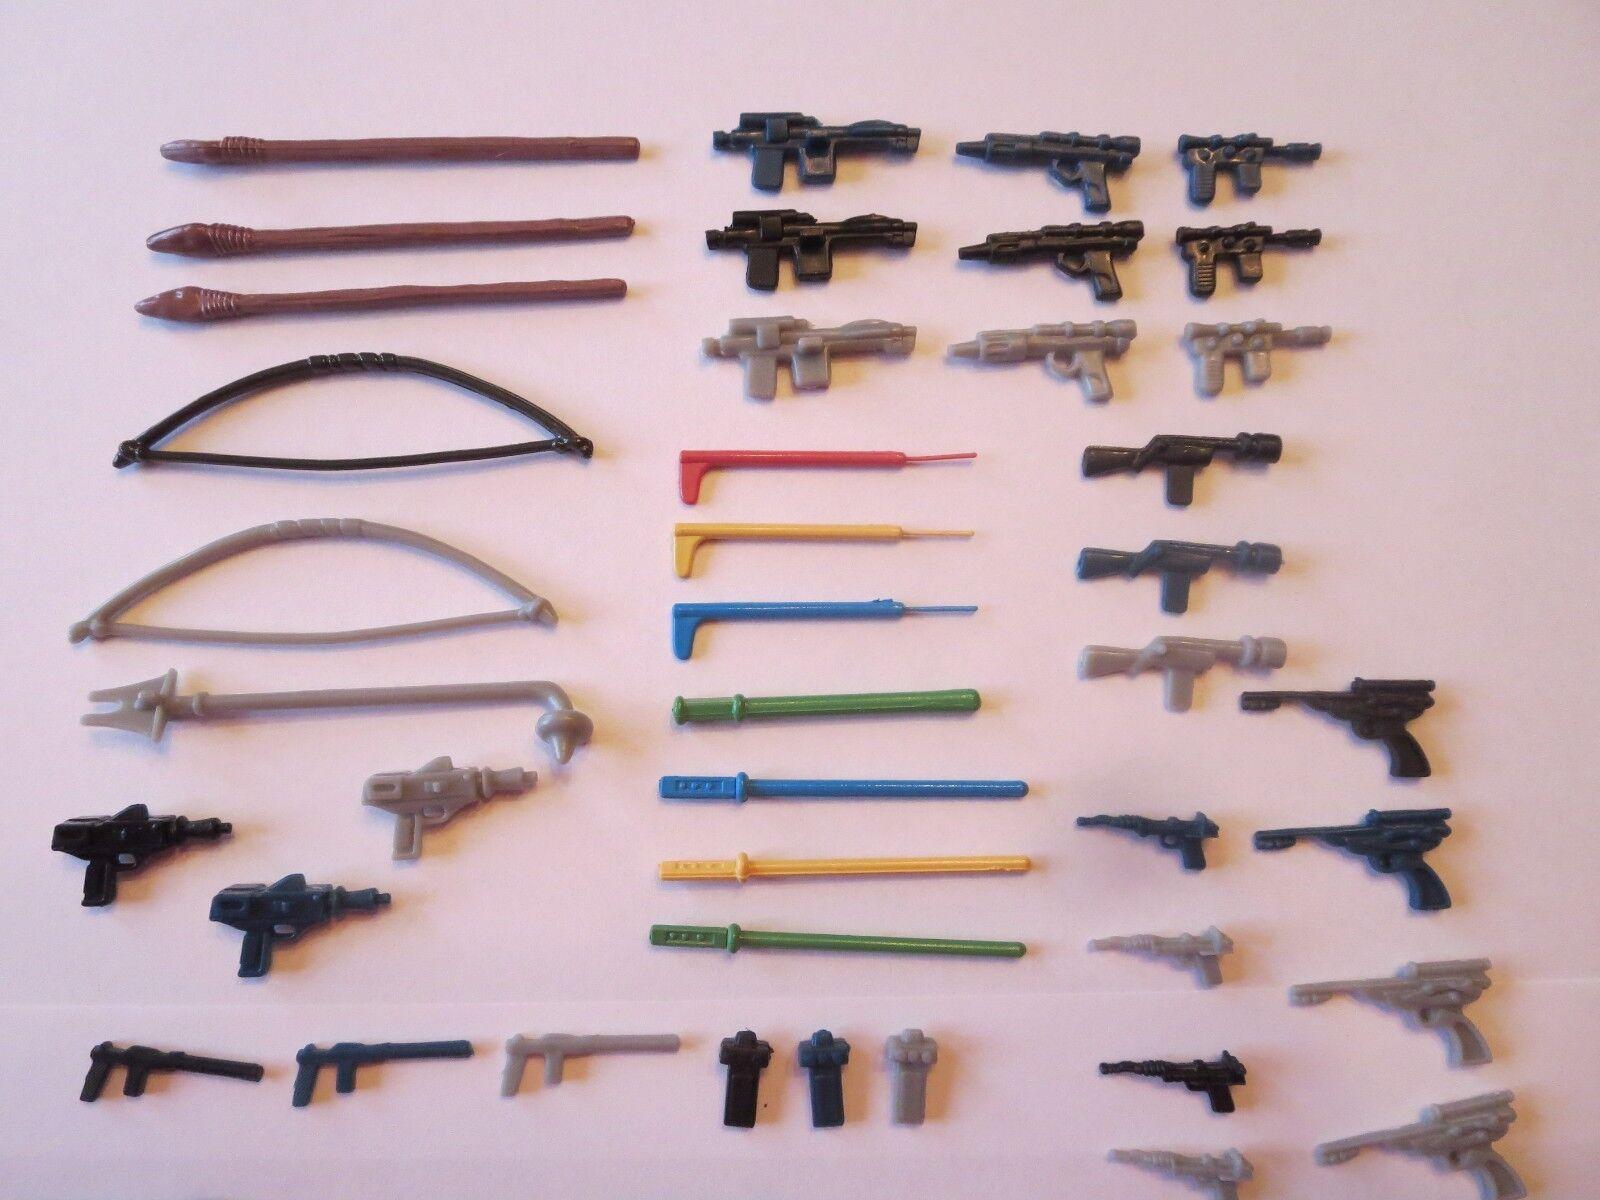 Star Wars Wars Wars Weapons For Vintage Figures Replacements 4d7eef